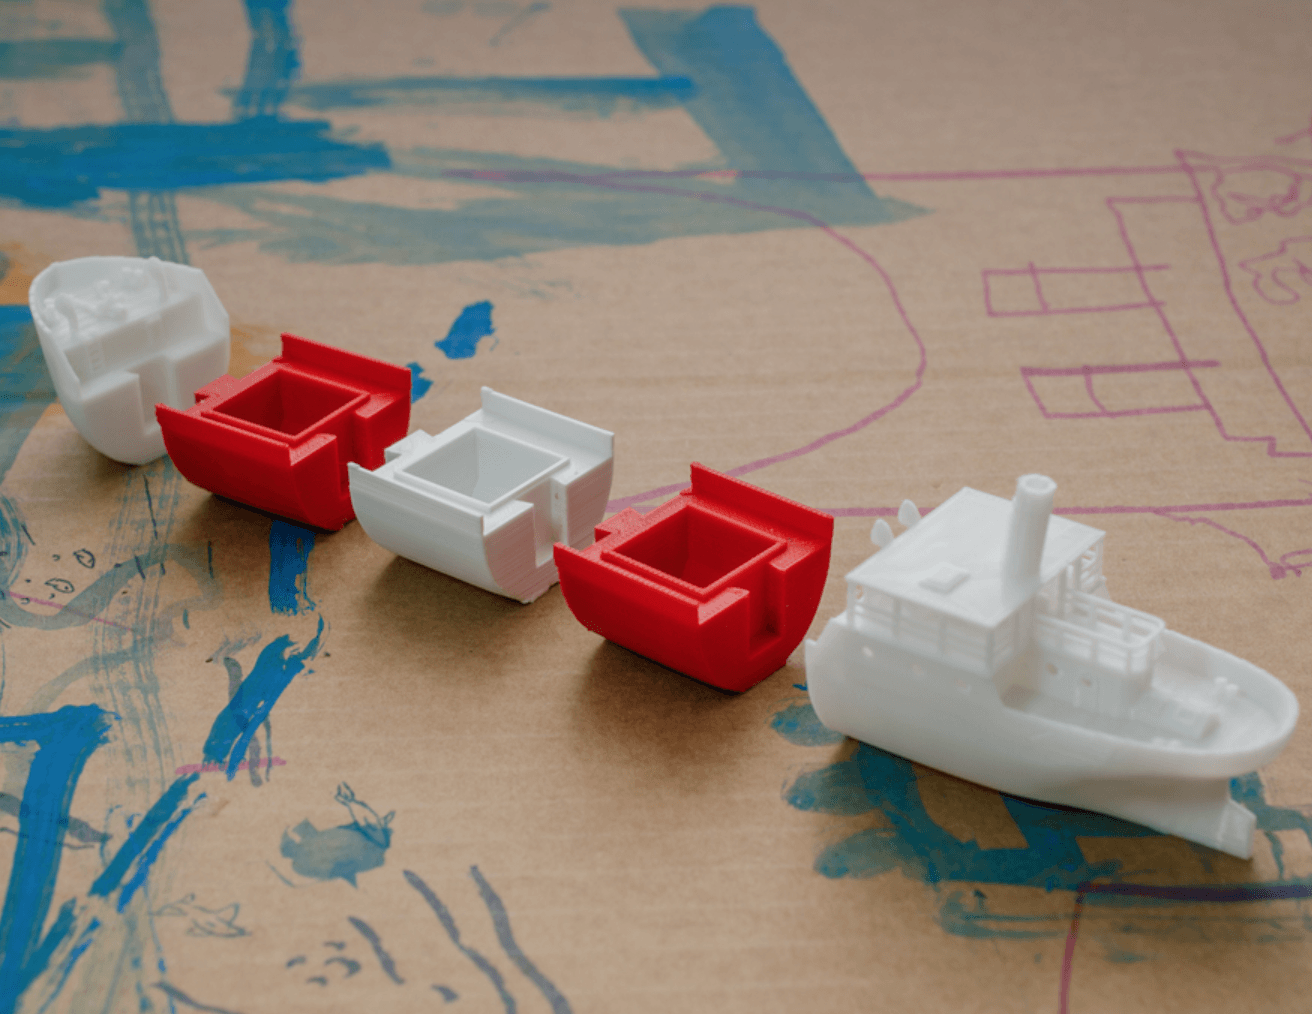 Capture d'écran 2018-04-09 à 18.10.00.png Download free STL file CAS - the modular xyz-cube cargo ship • 3D printing template, vandragon_de